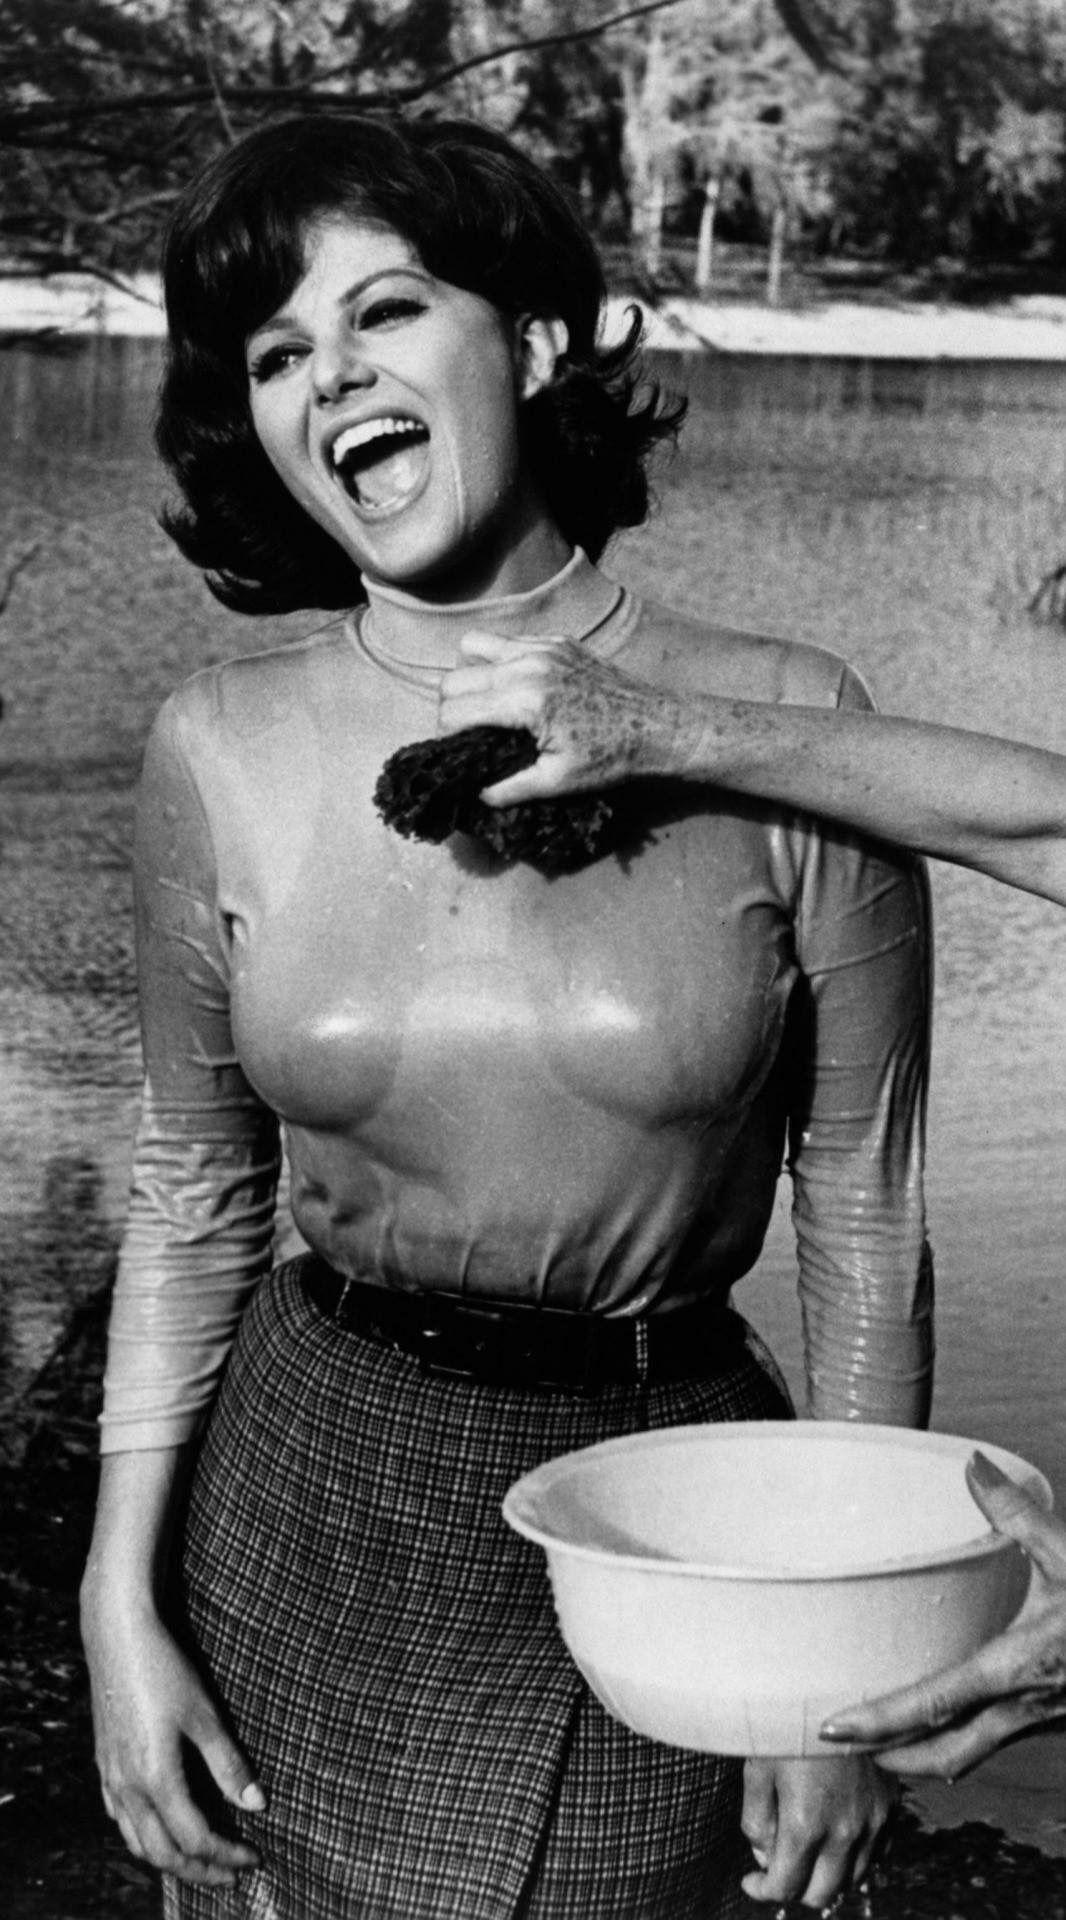 foto Claudia Cardinale (born 1938 (born and raised in Tunis, Tunisia